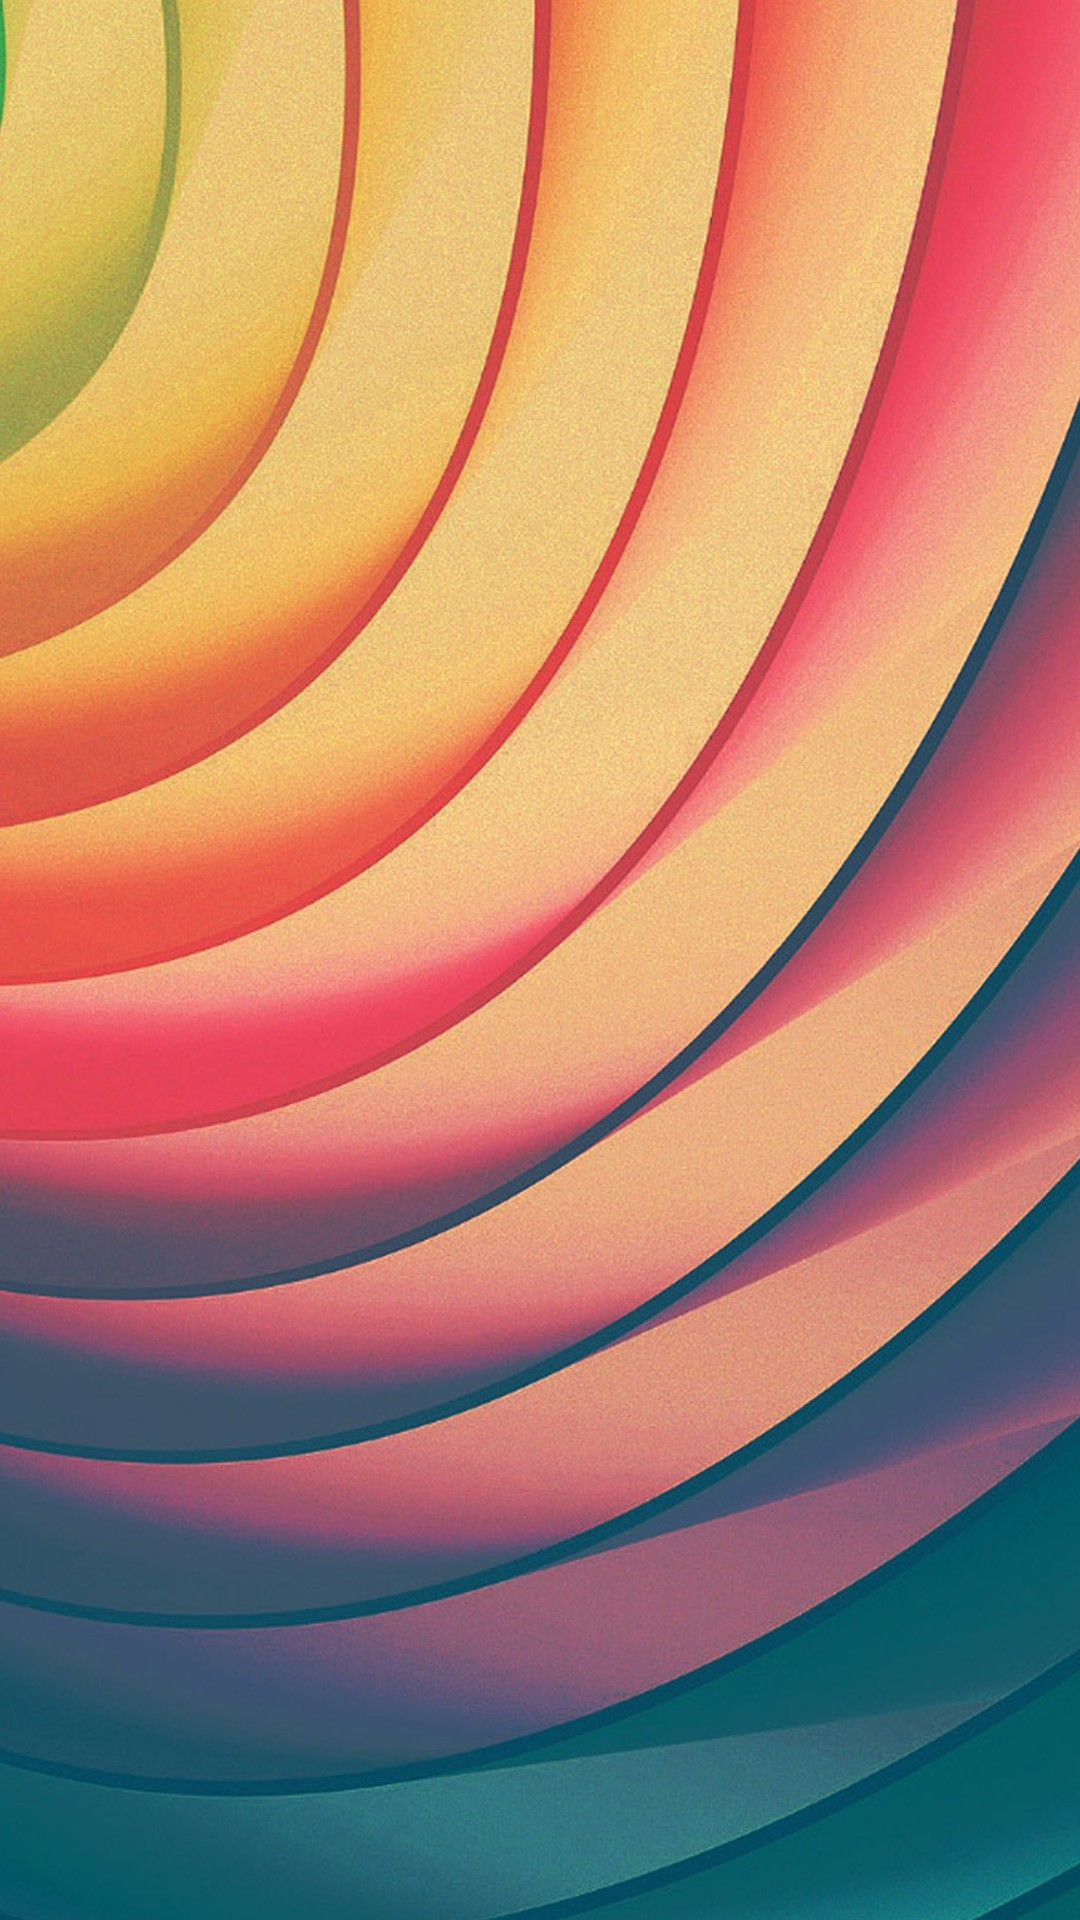 Retro iphone 7 wallpaper